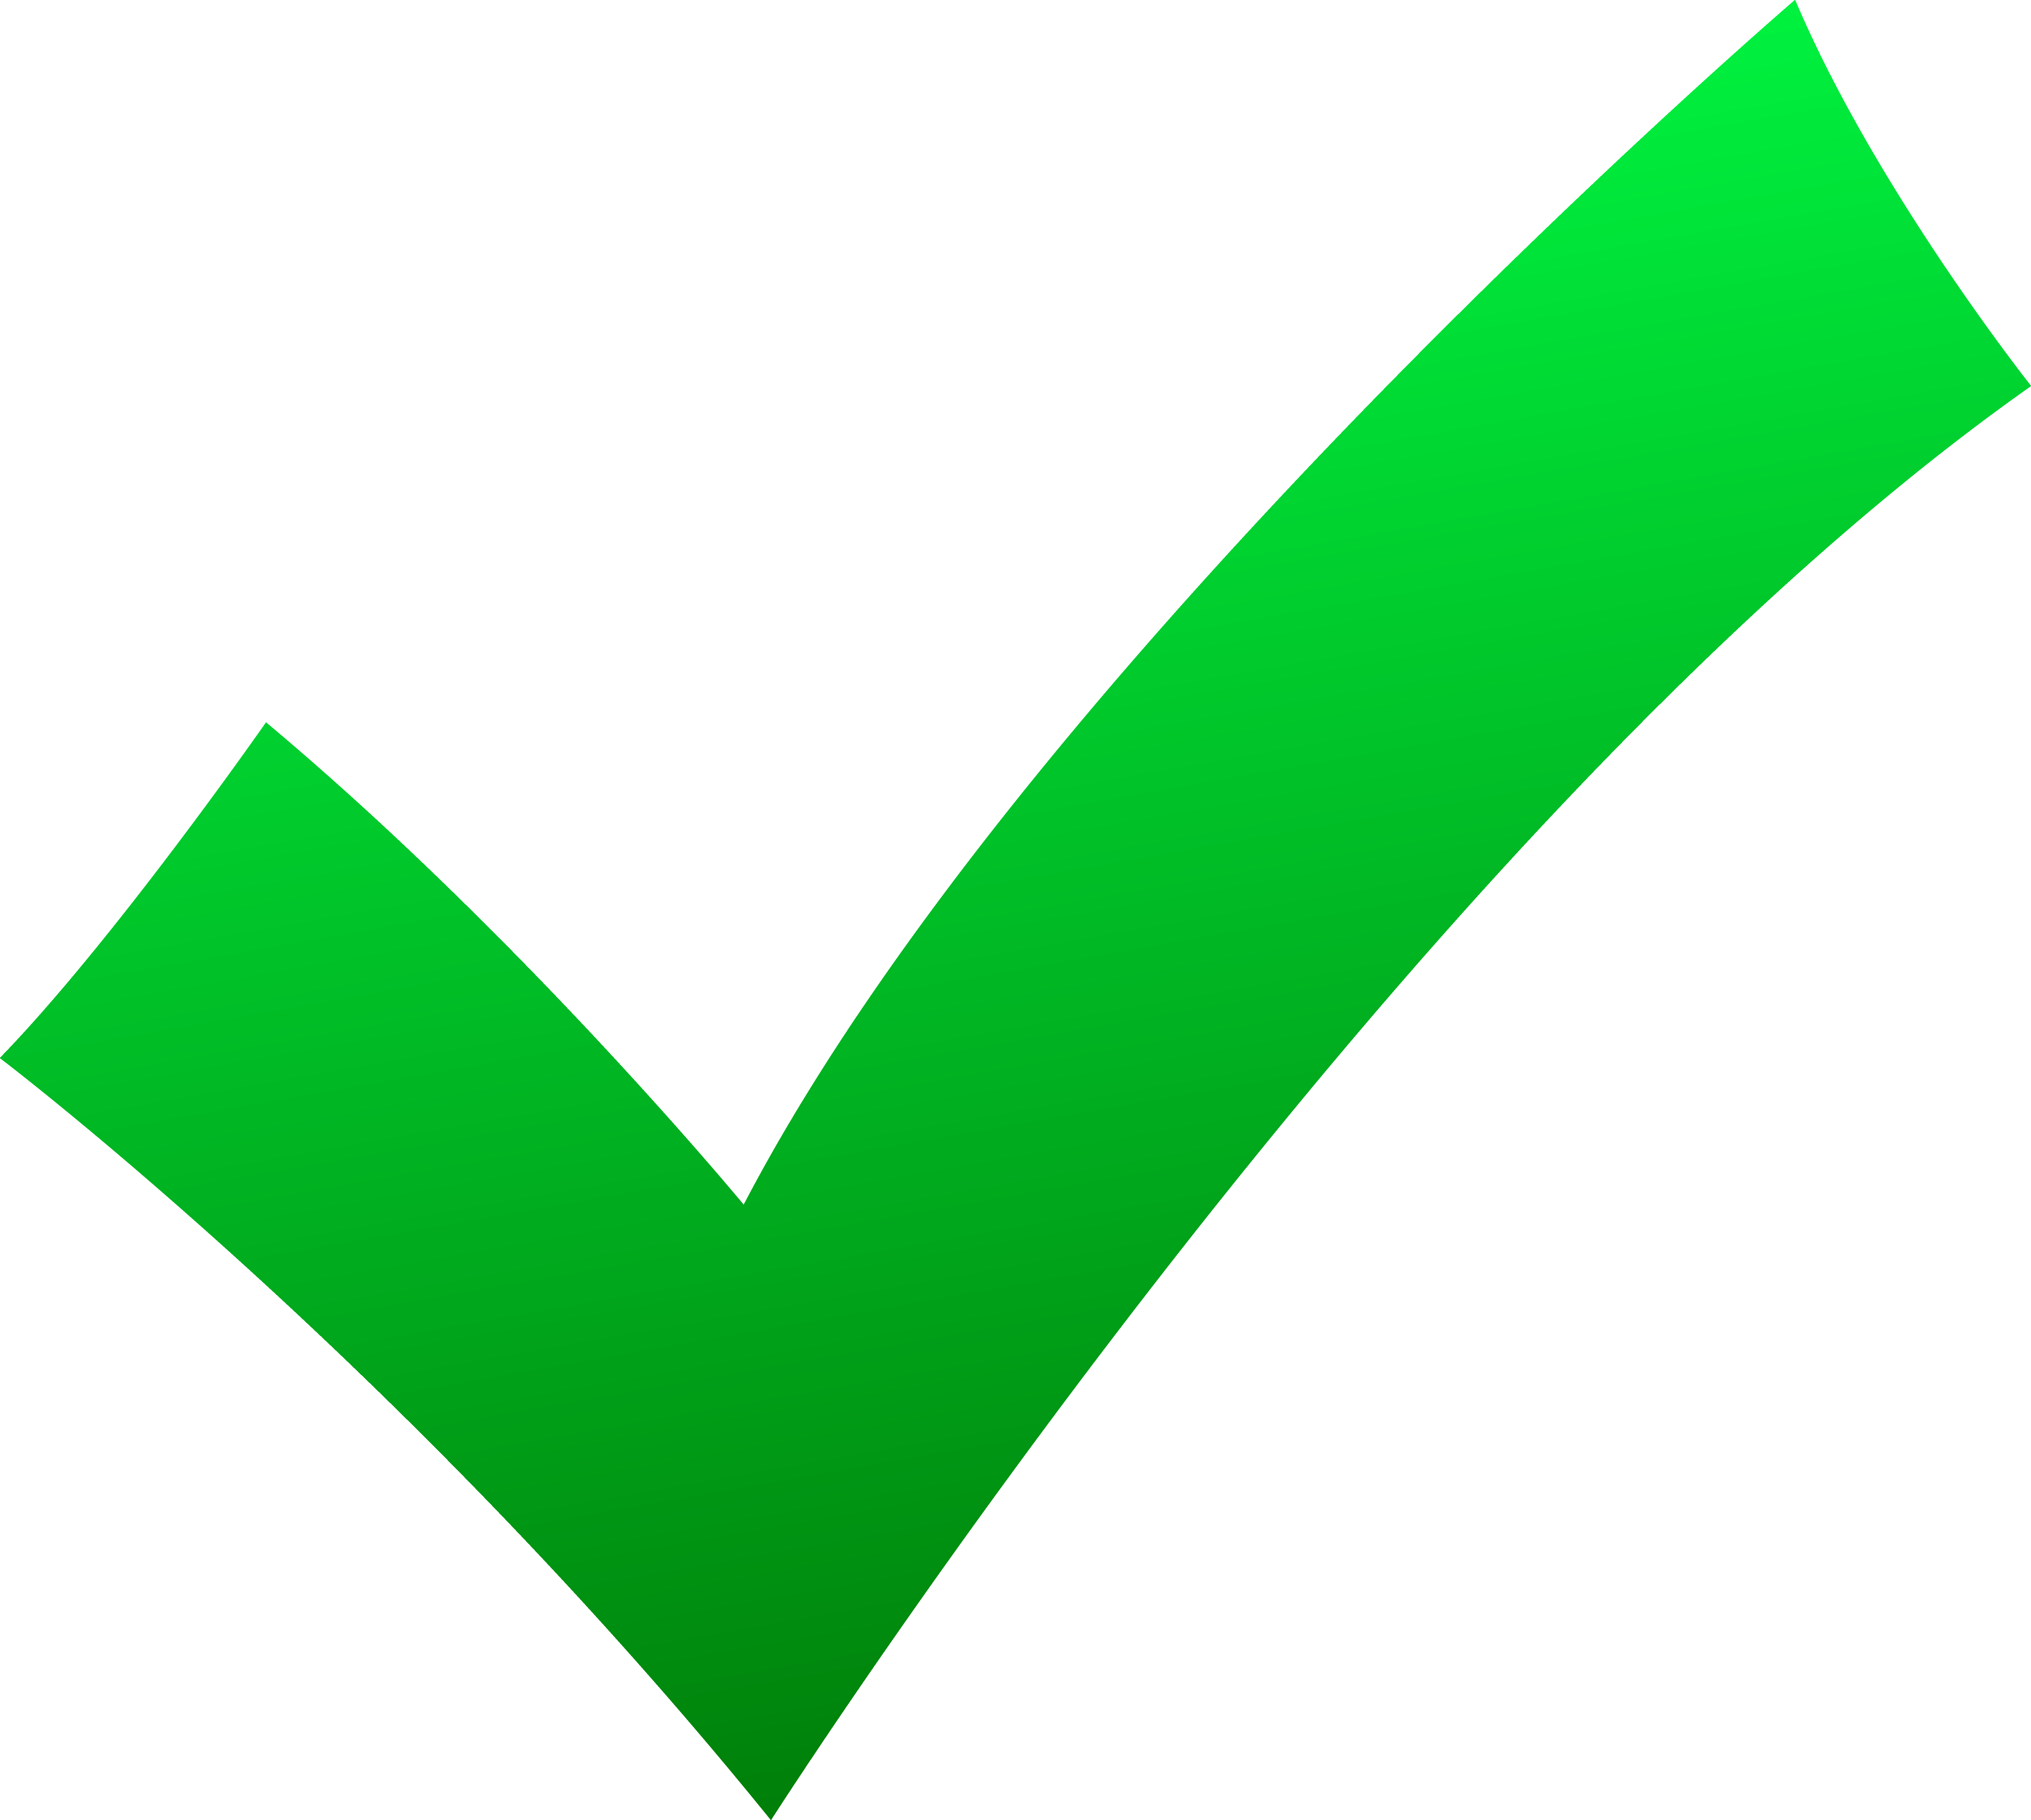 ... Free Clipart Check Mark Symbol ...-... Free clipart check mark symbol ...-13